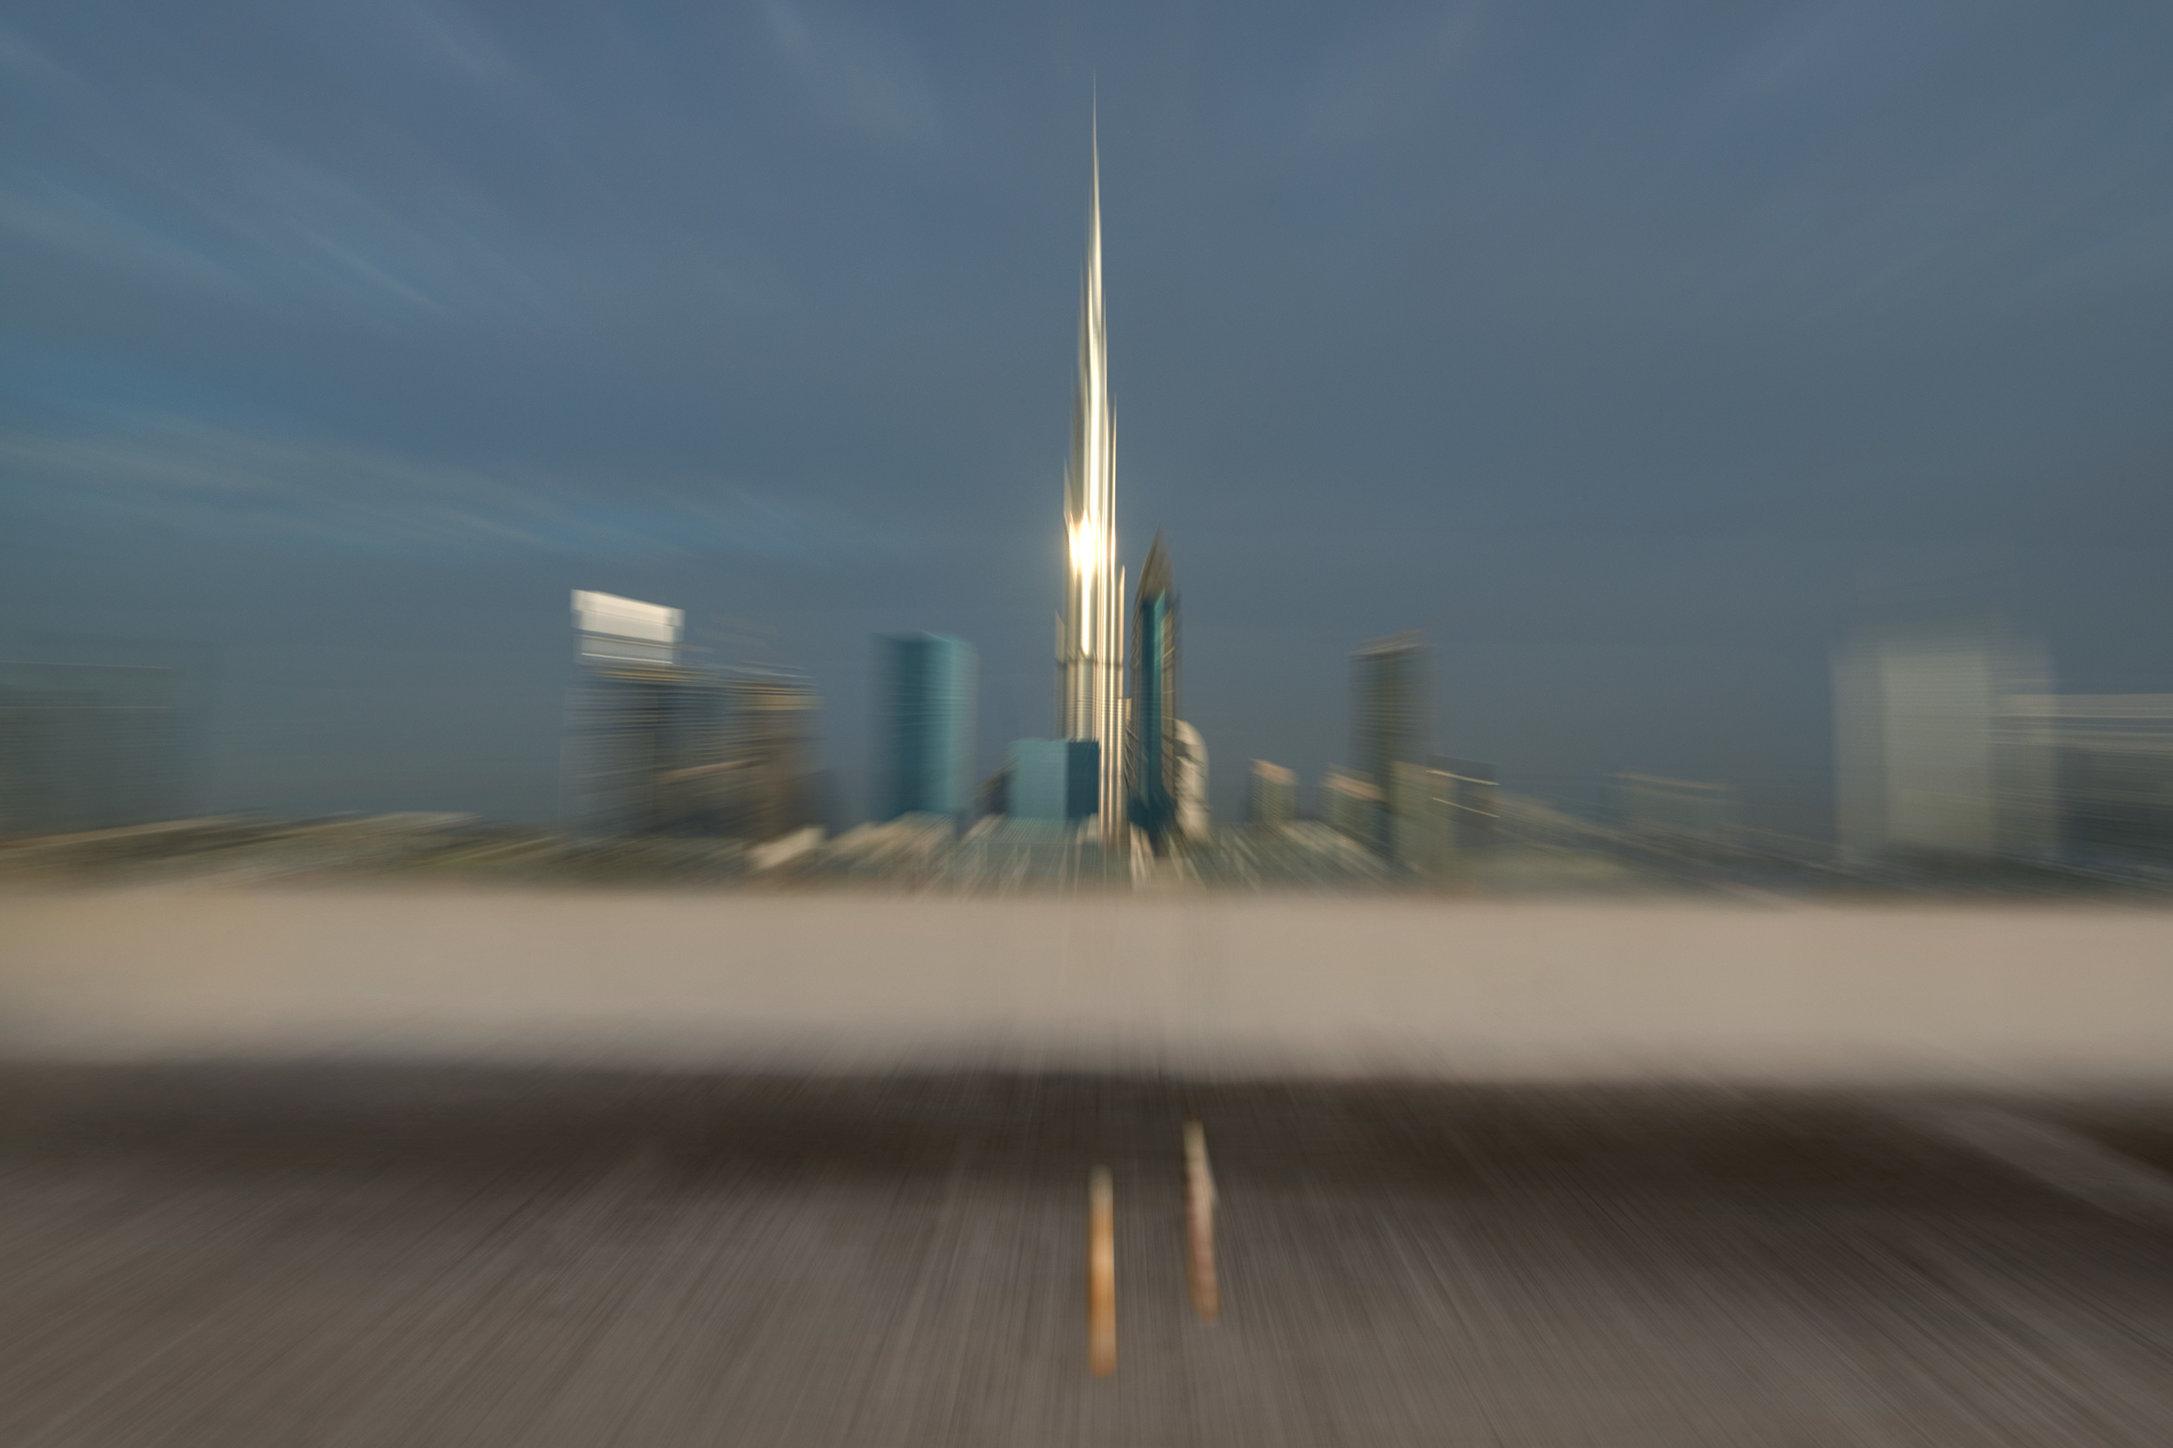 City / Dubai / Mirage